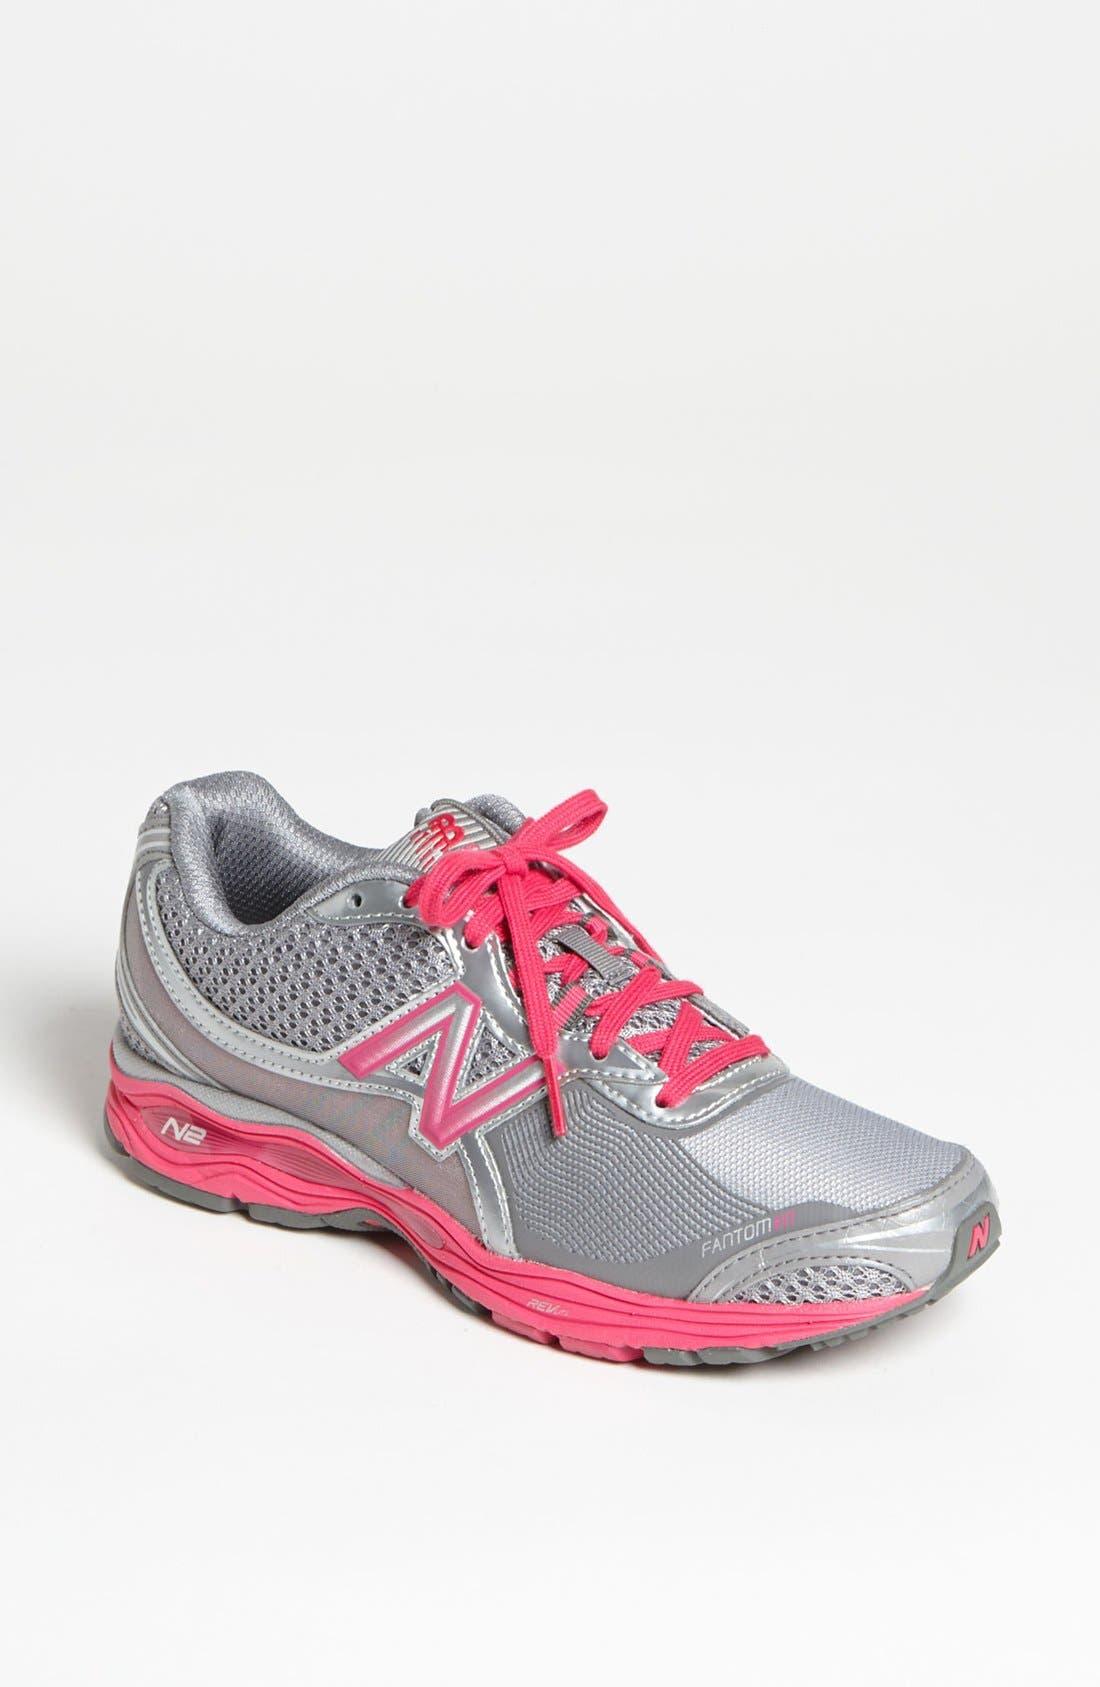 Alternate Image 1 Selected - New Balance '1765' Walking Shoe (Women)